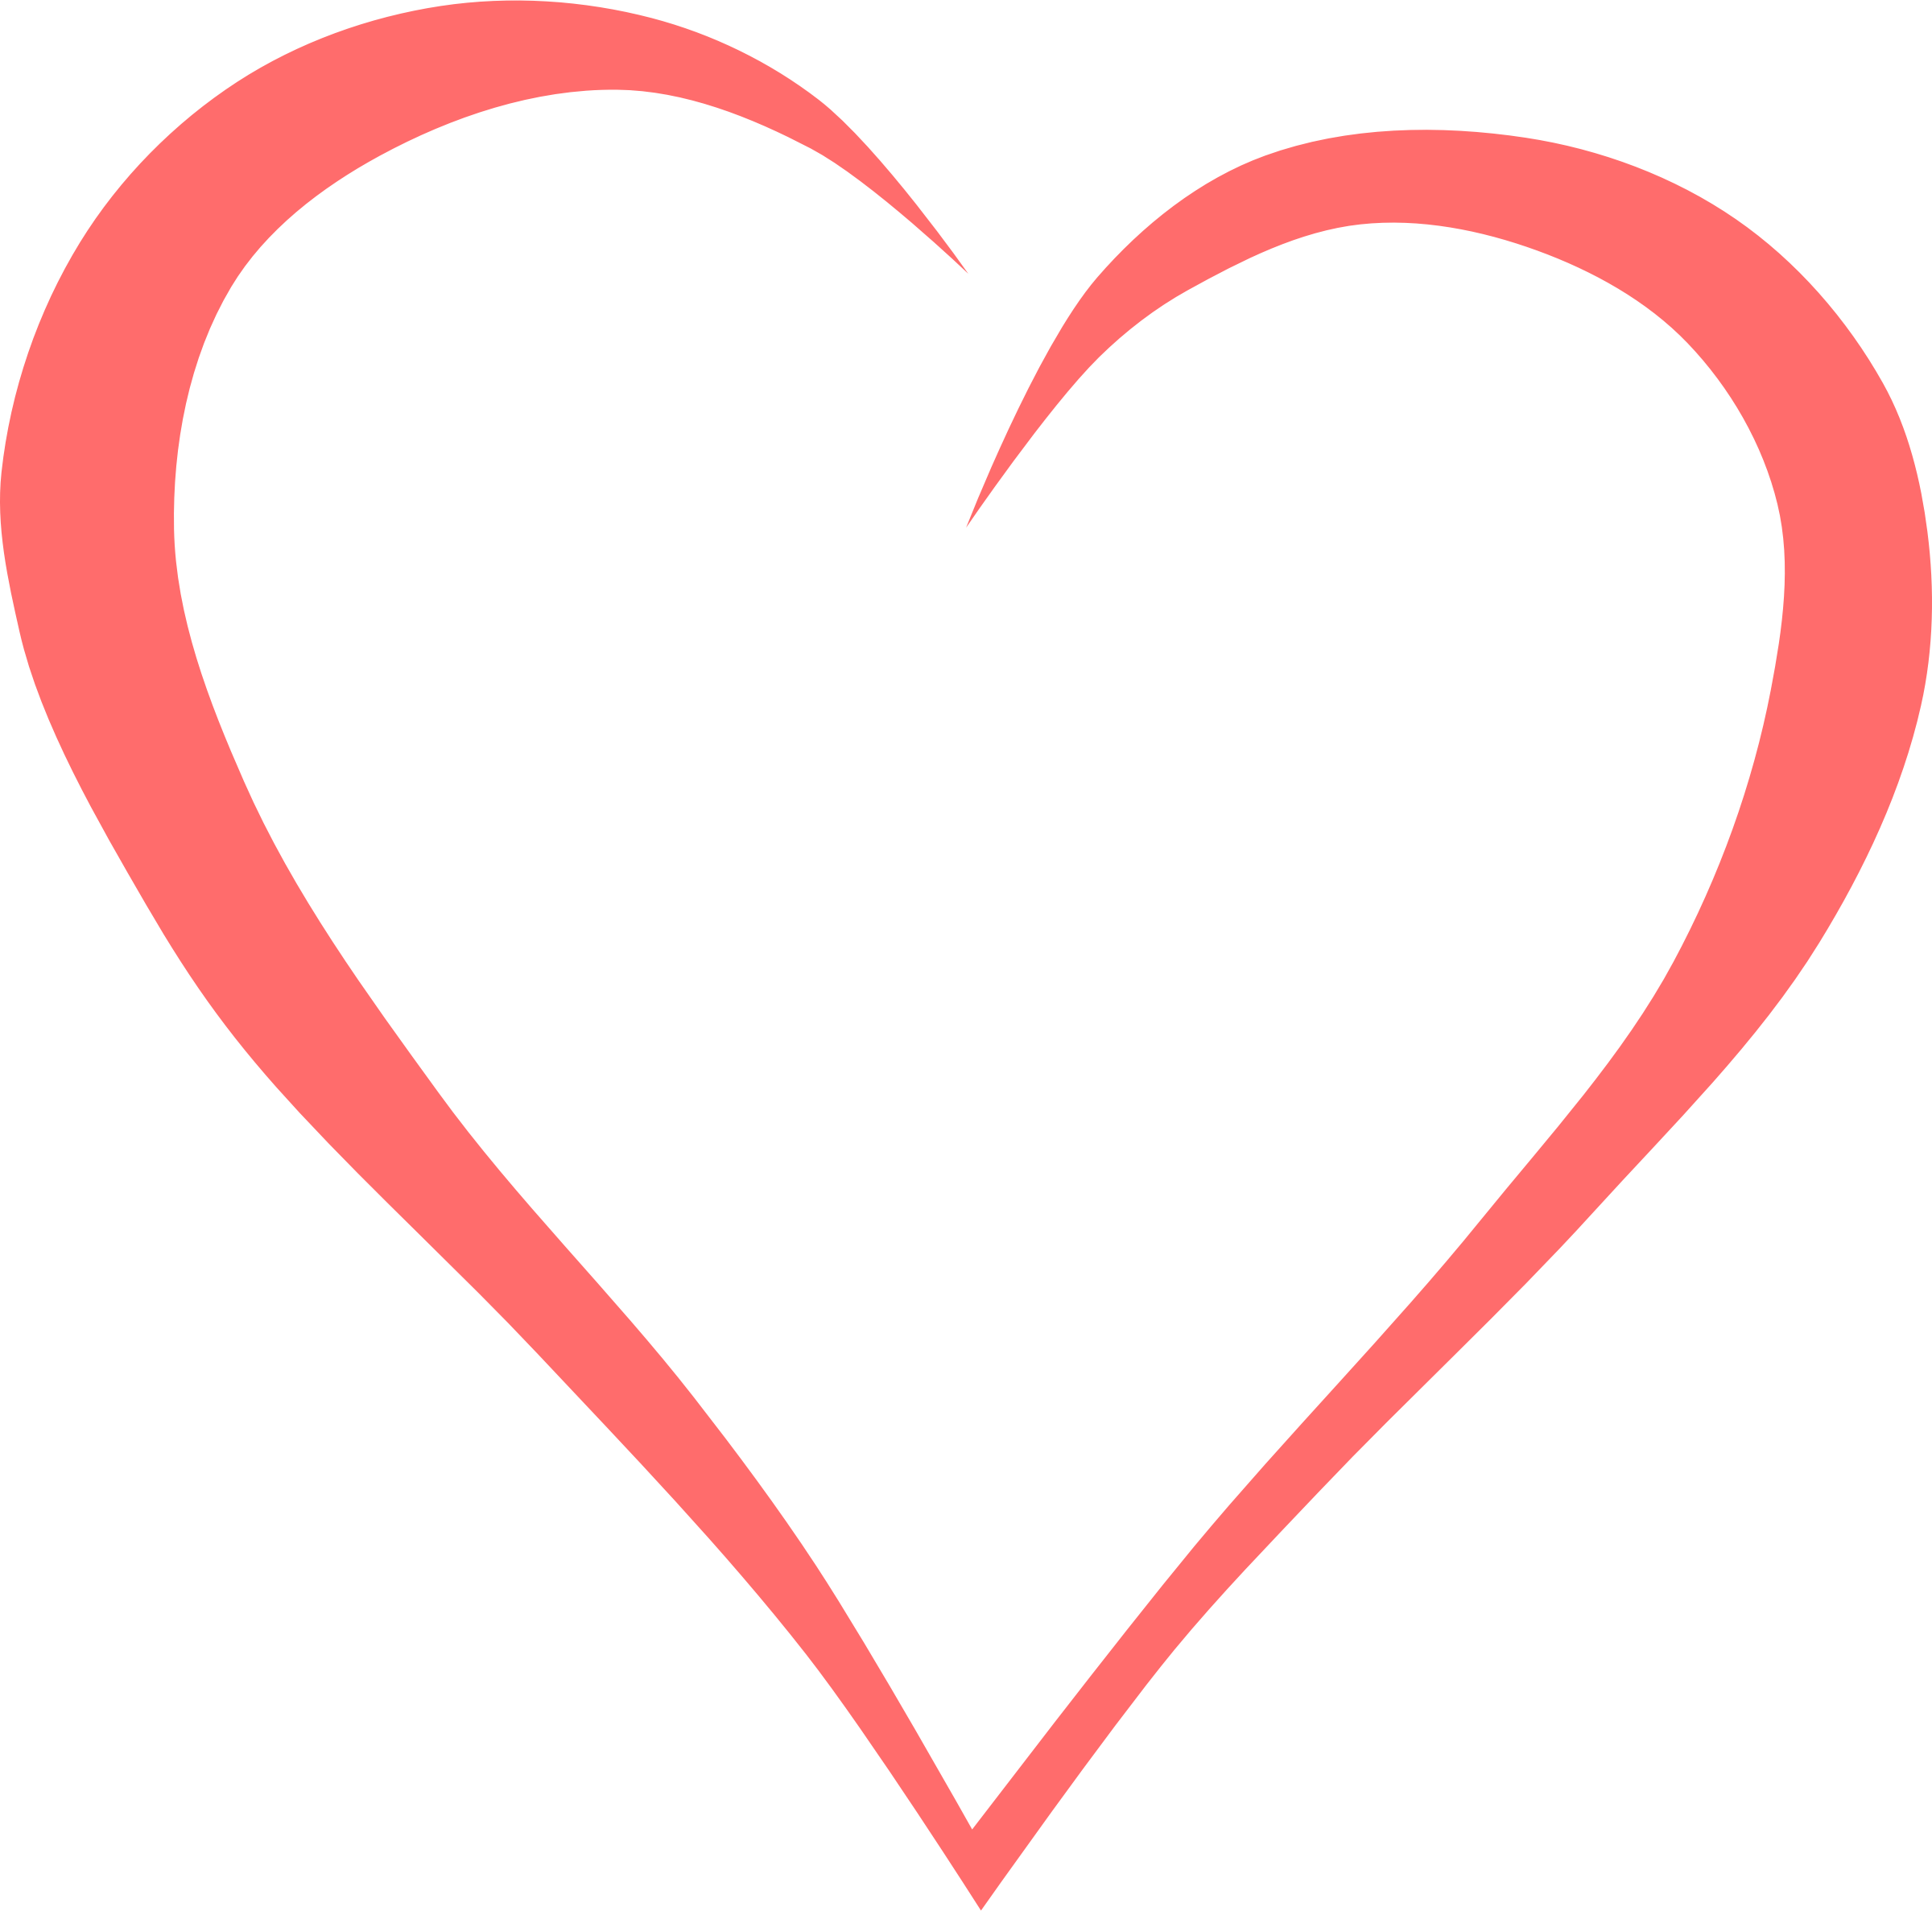 Cracked heart clipart vector stock Clipart - Abstract heart 6 vector stock